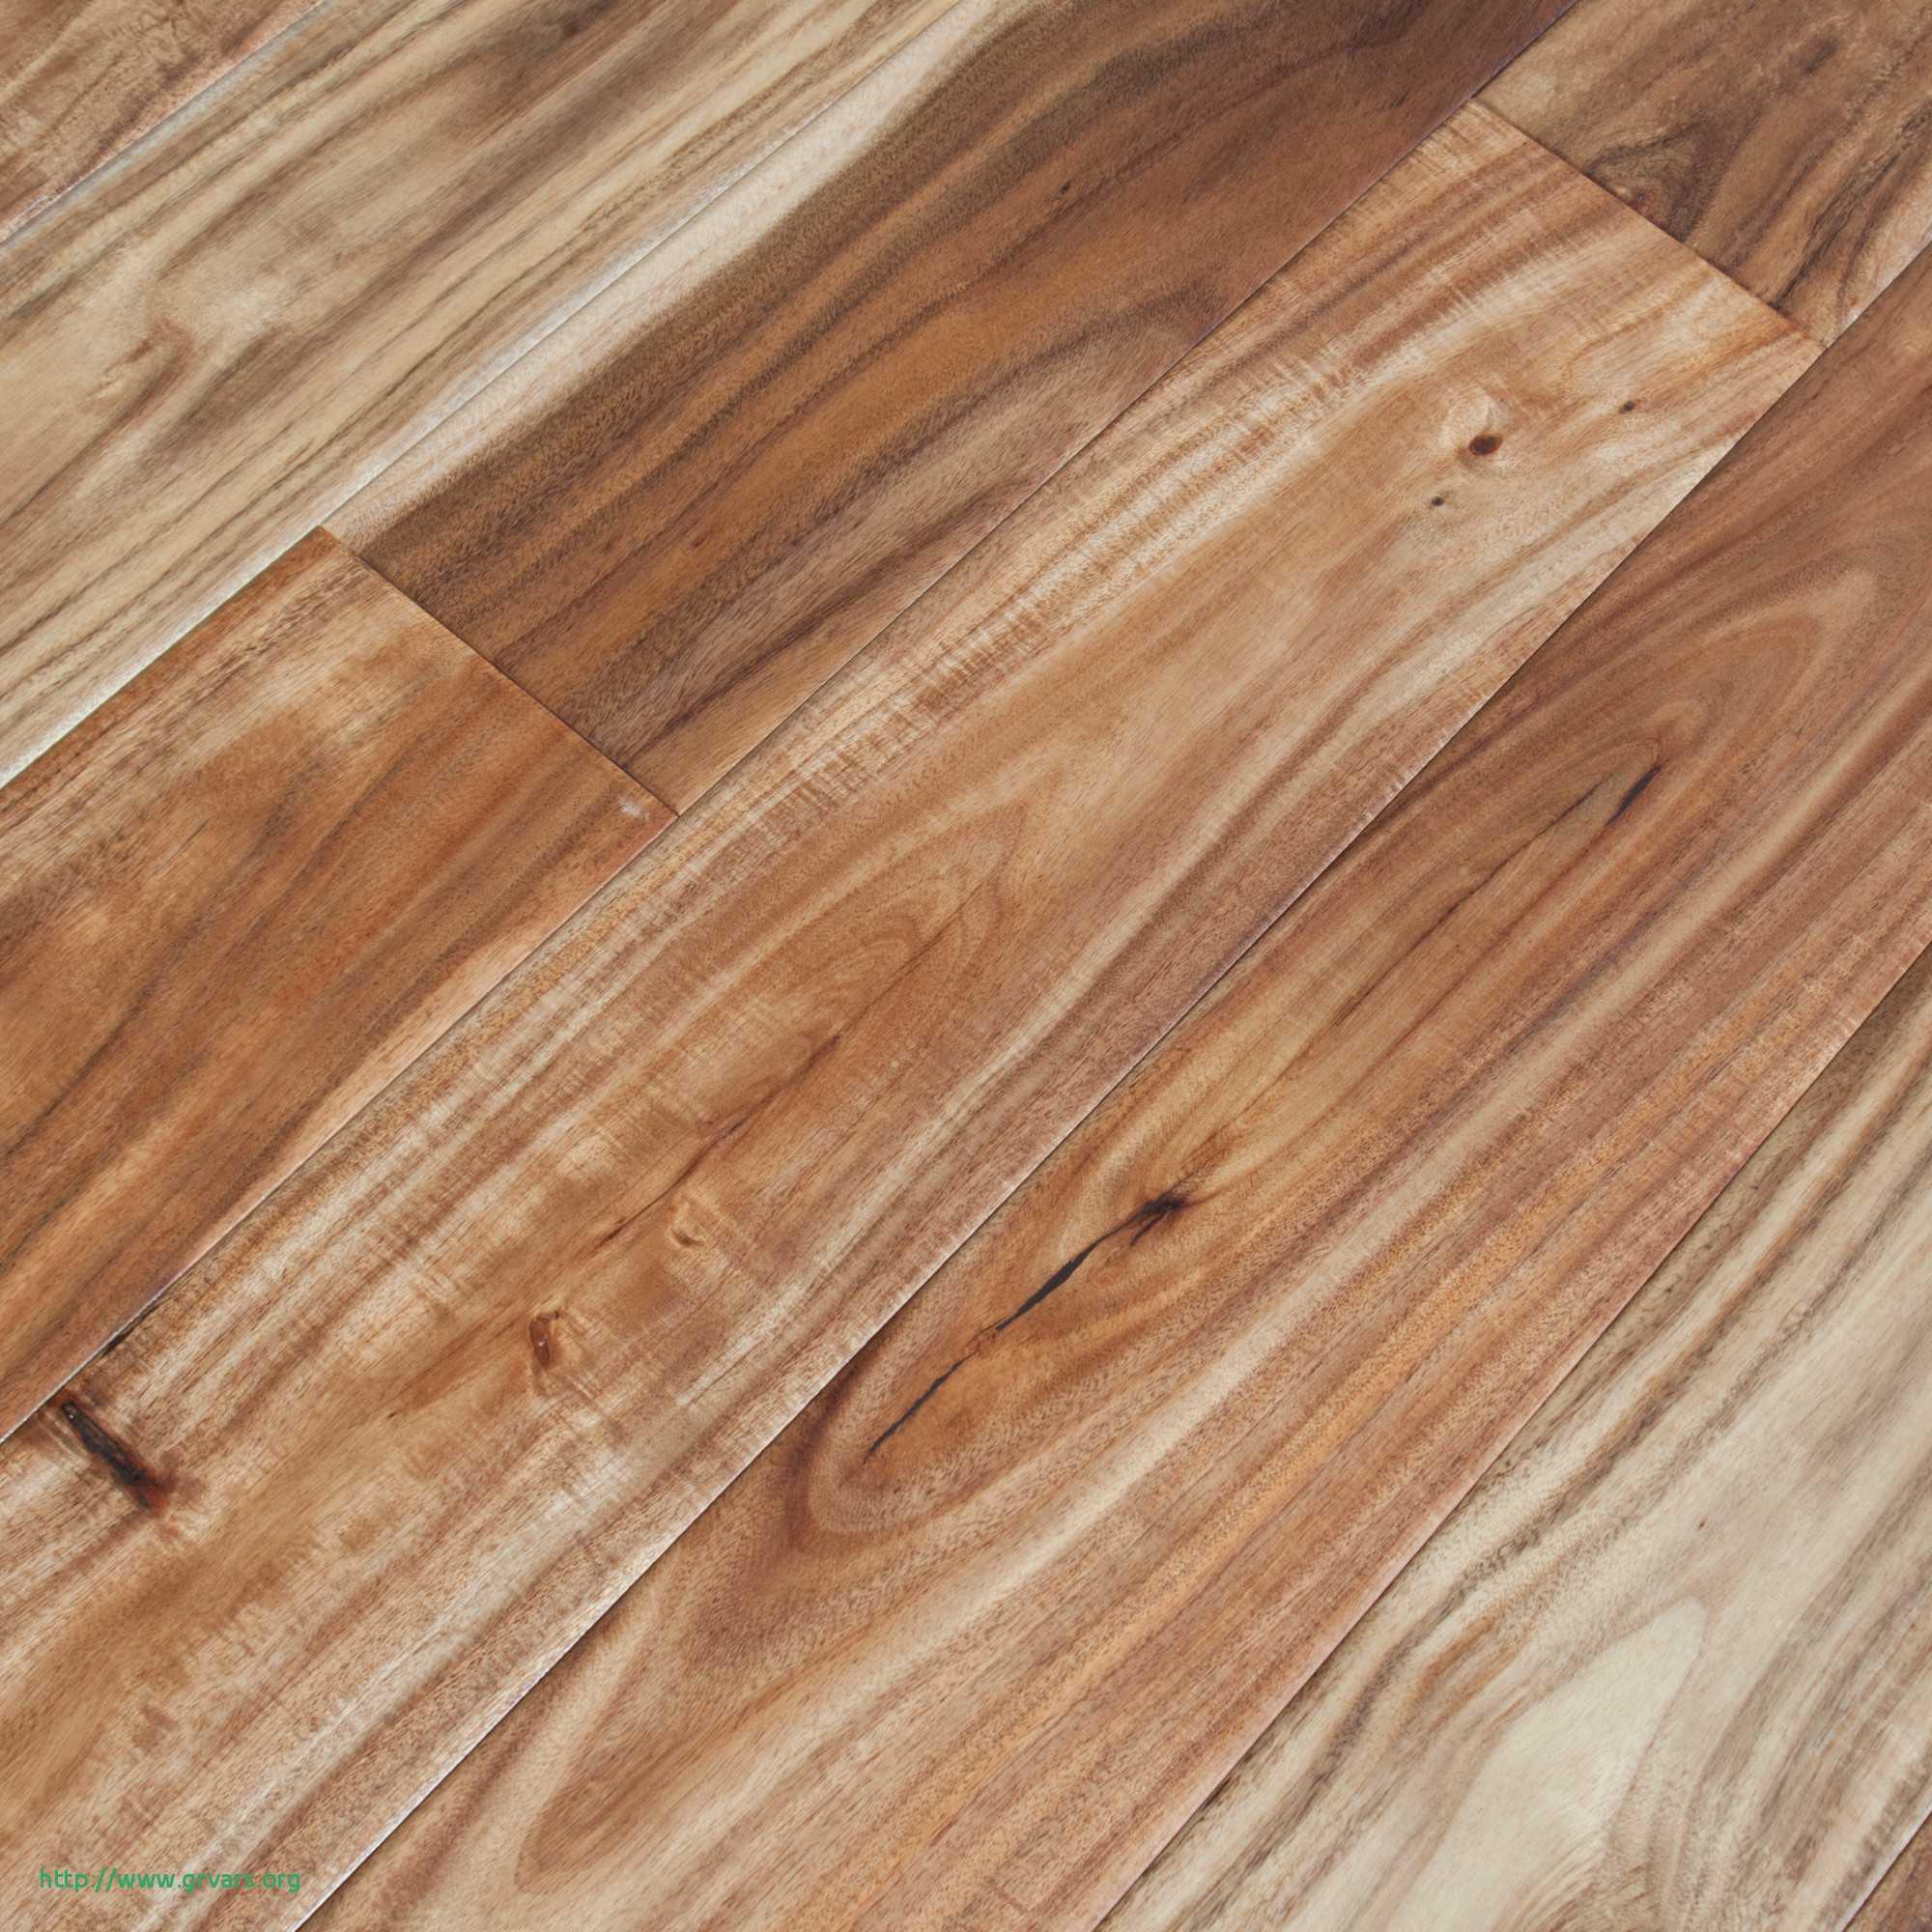 gaps in engineered hardwood floor of hardwood floor plank sizes frais why your engineered wood flooring within hardwood floor plank sizes beau 9 mile creek acacia hand scraped